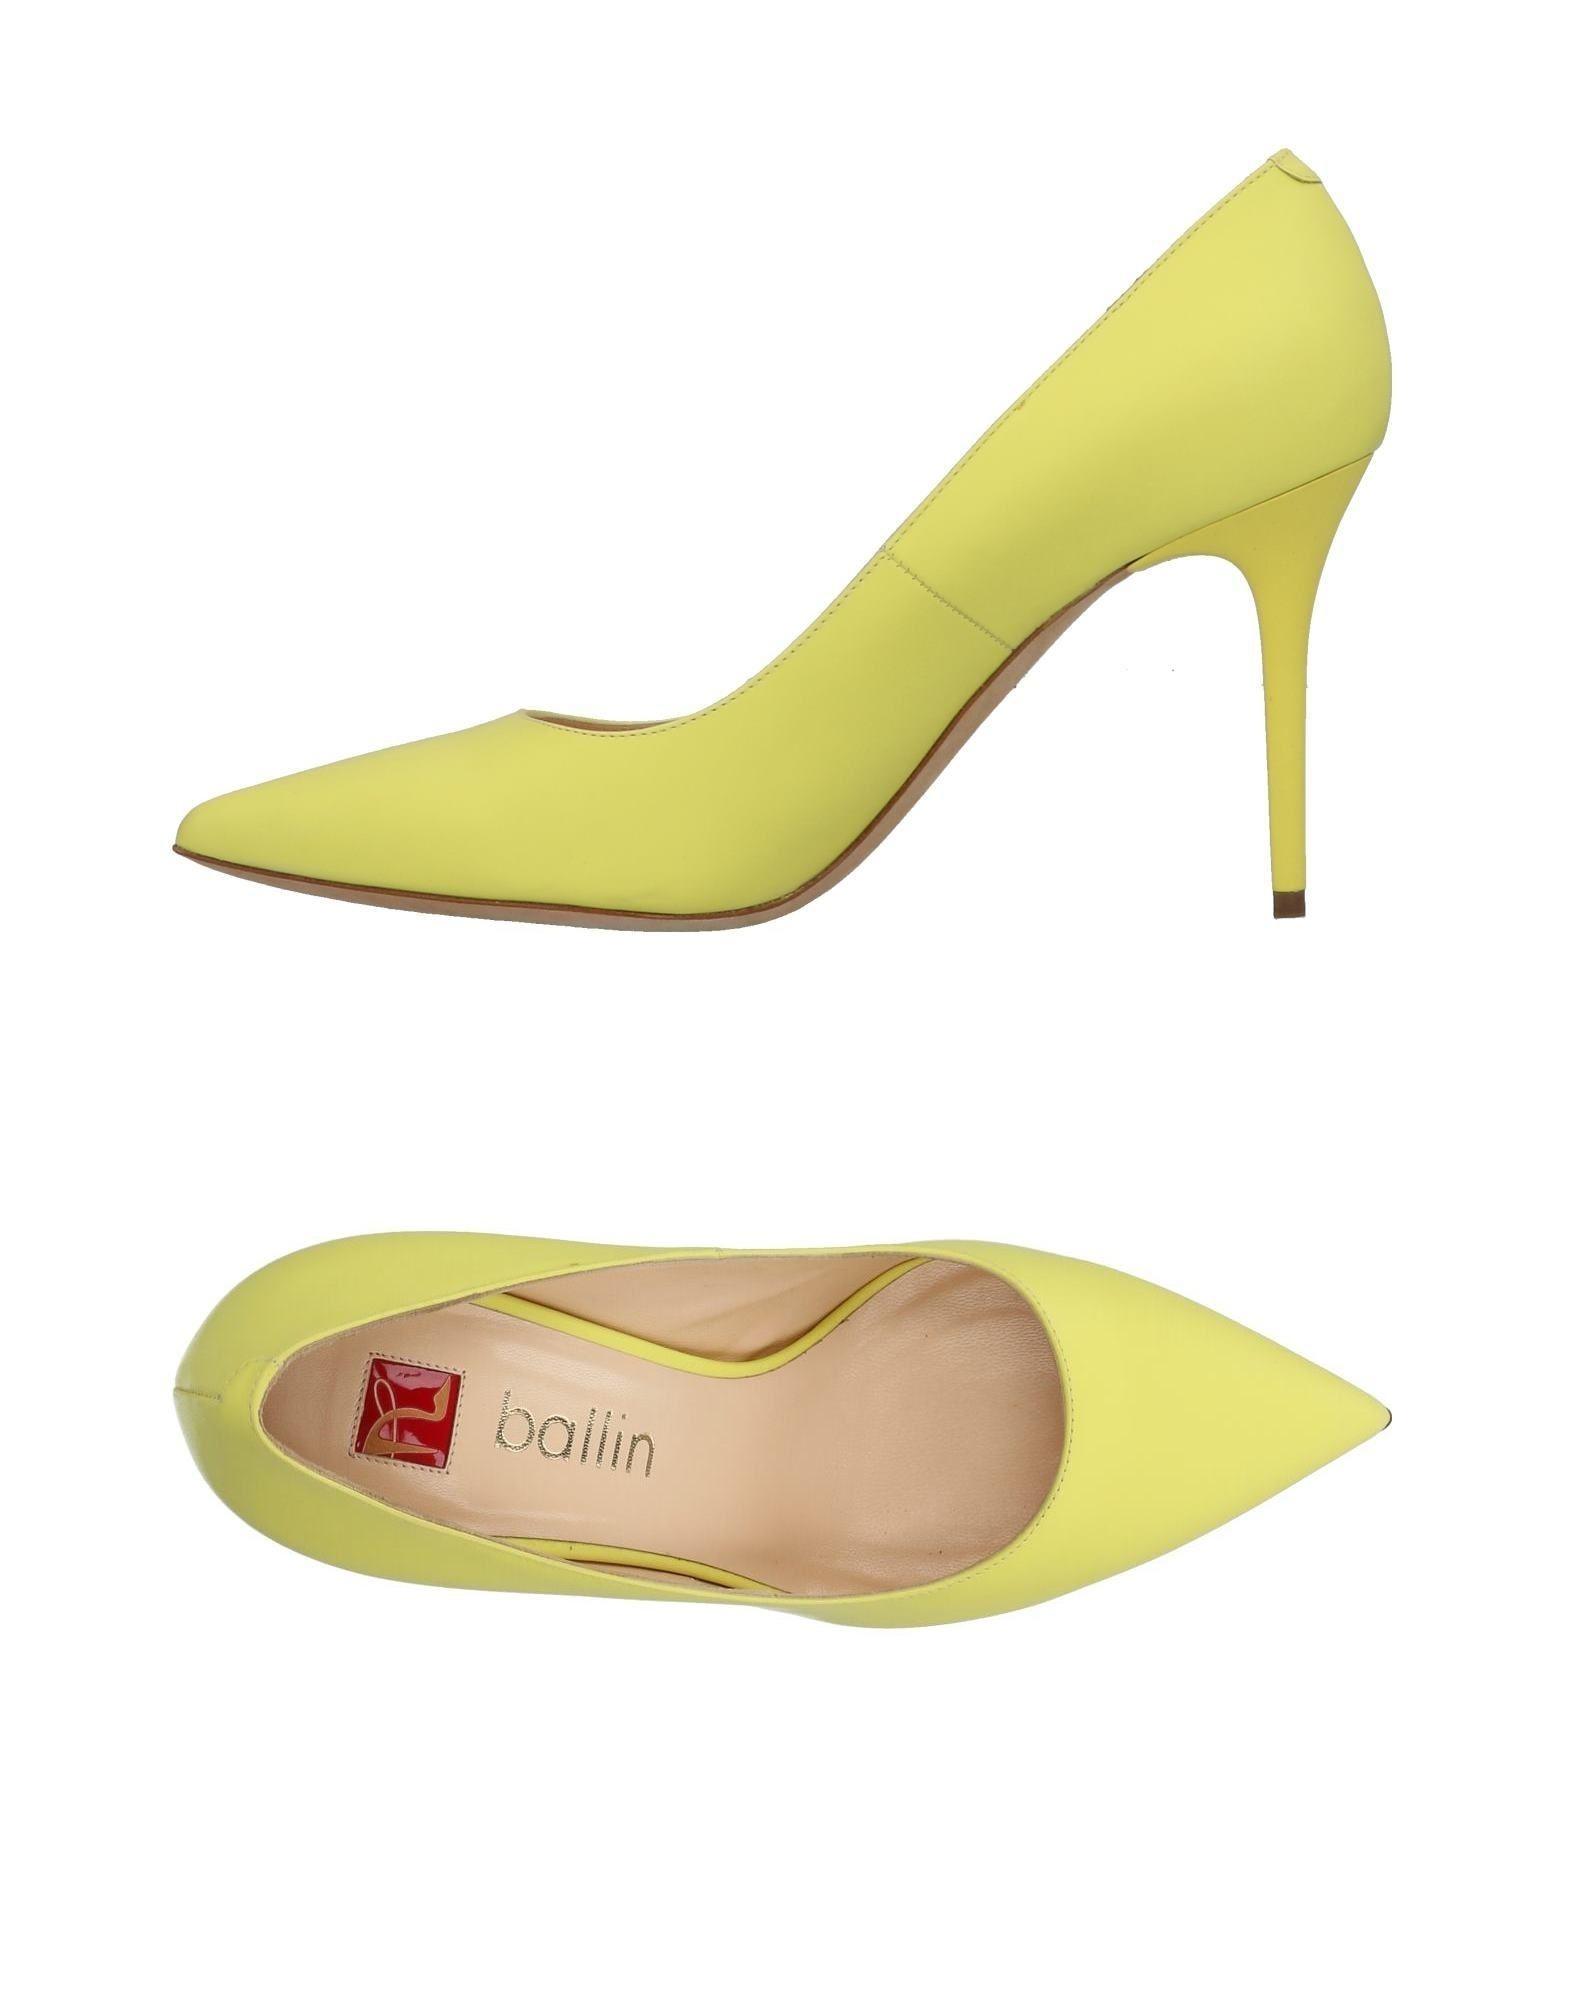 Stilvolle billige Schuhe Damen Ballin Pumps Damen Schuhe  11432331RU 416ba6